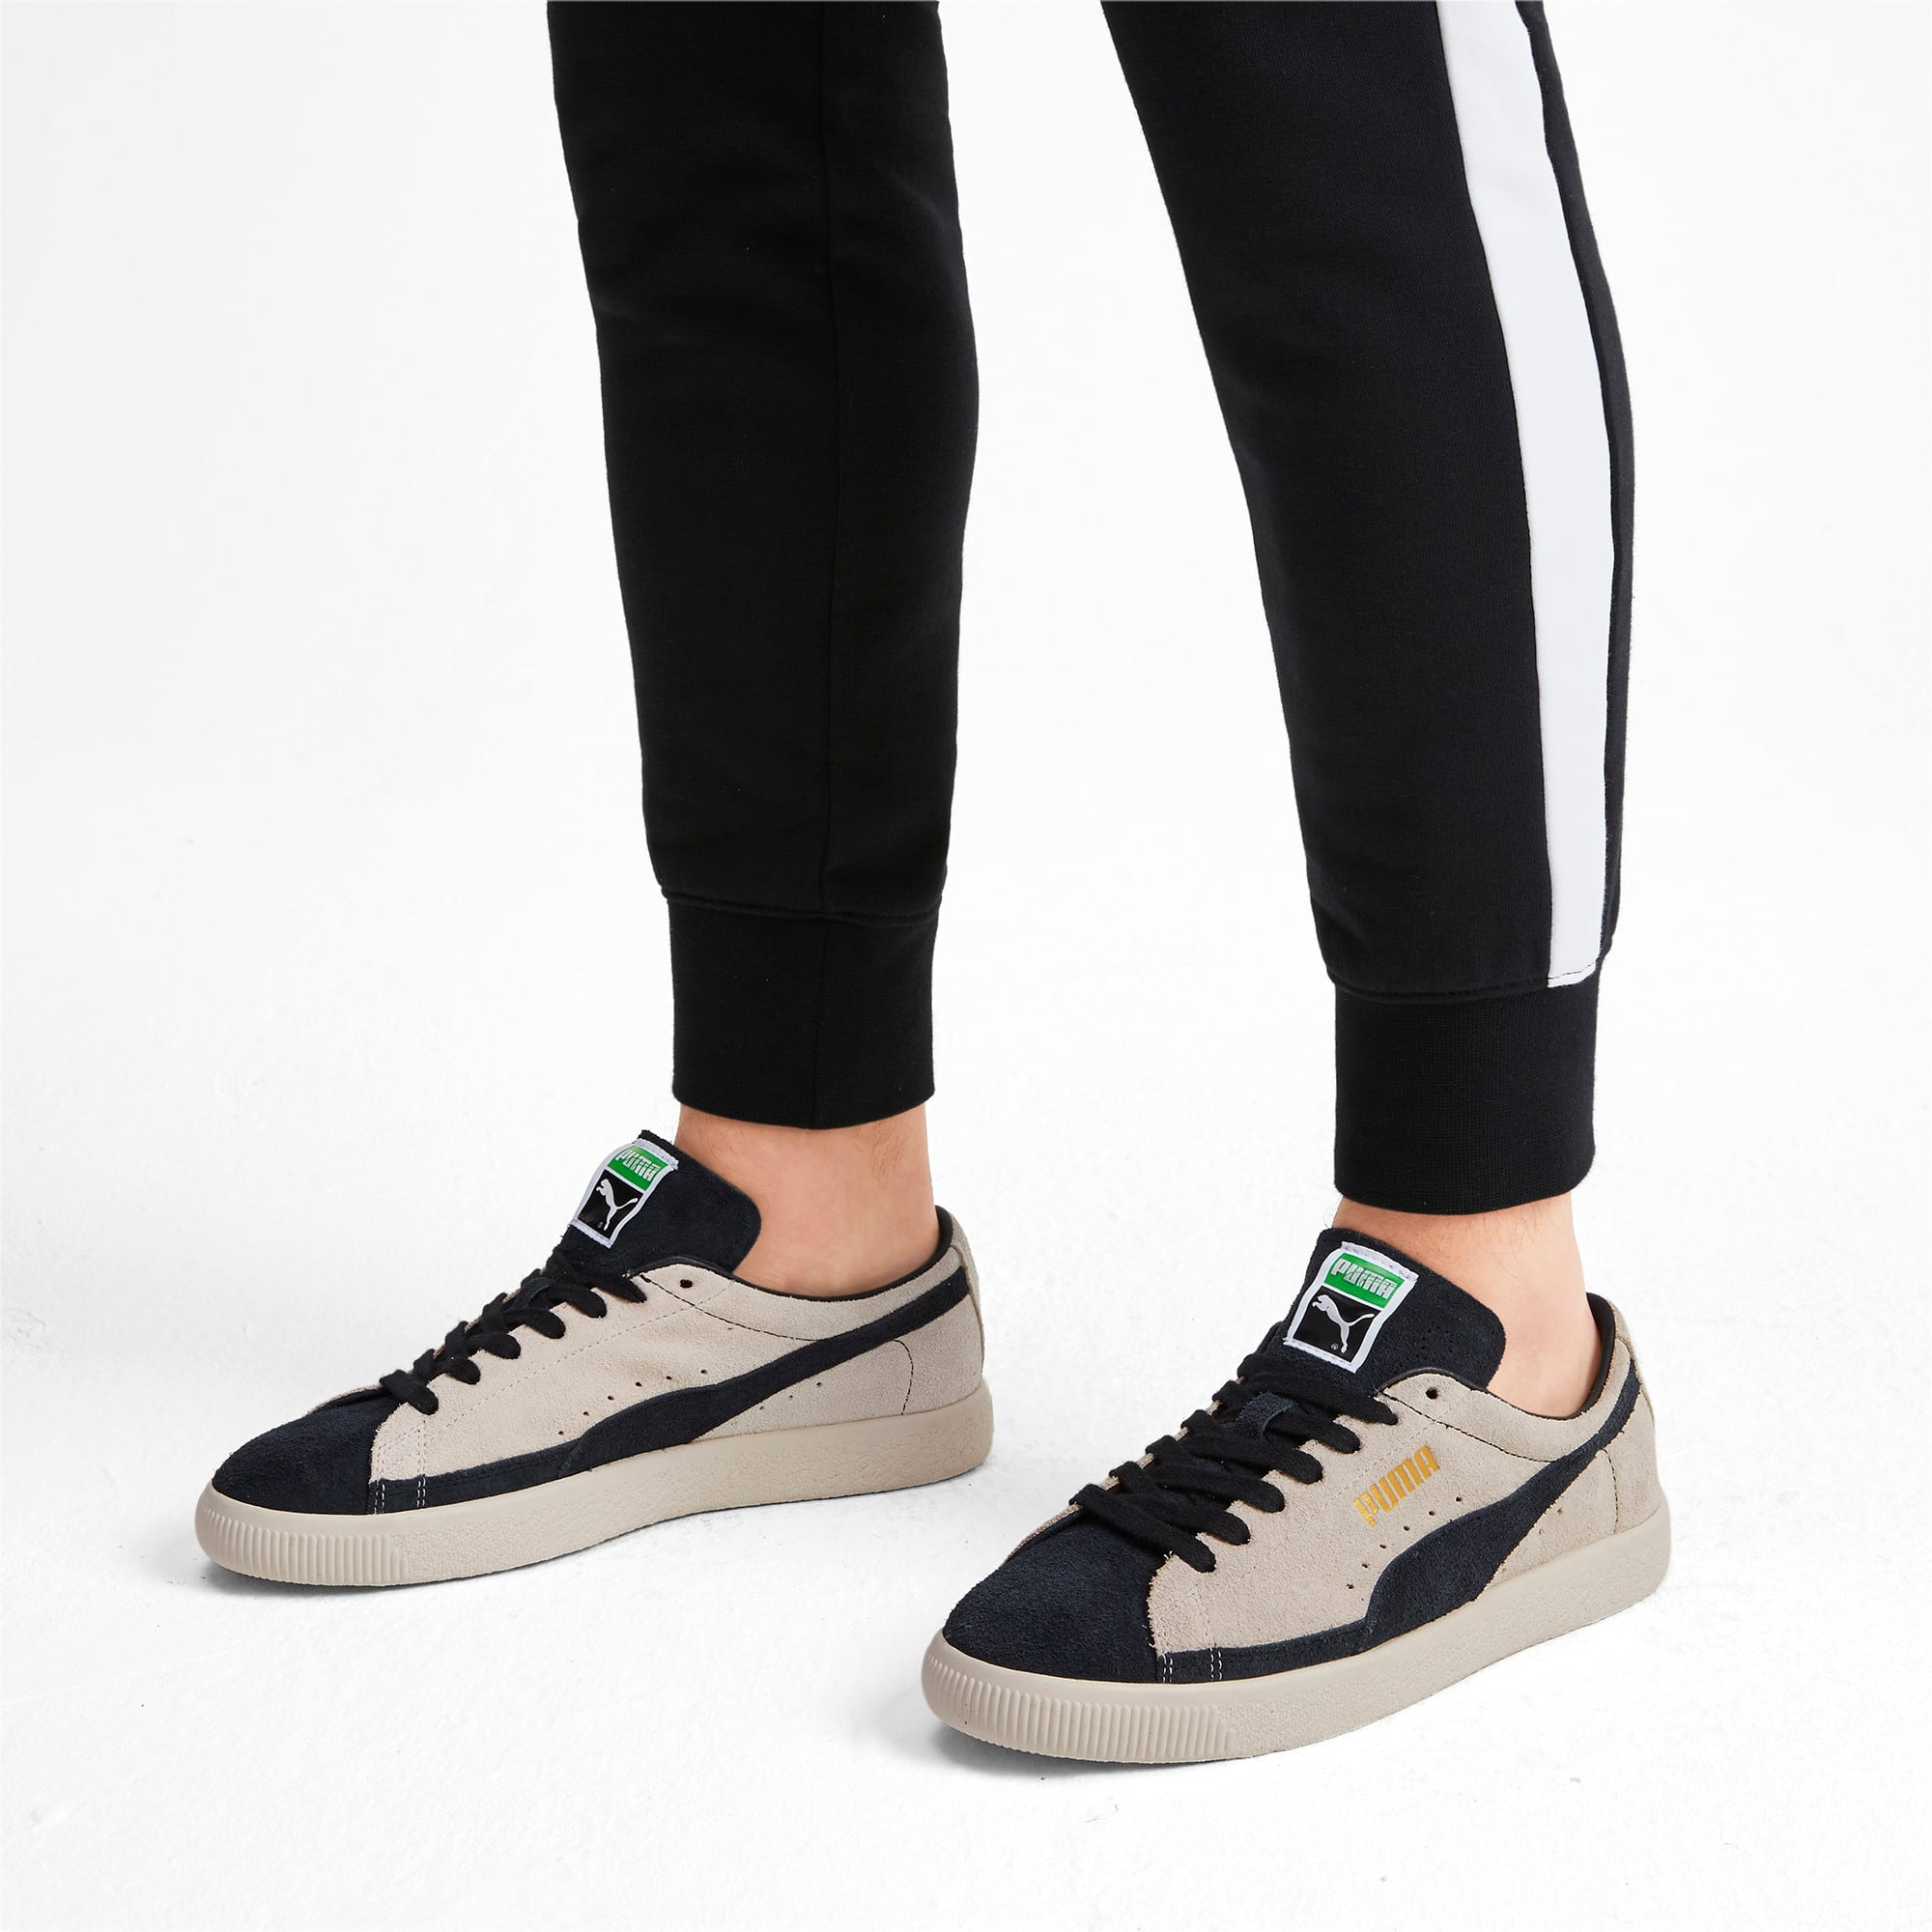 Thumbnail 3 of Suede 90681 Vintage Sneakers, Whisper White-Puma Black, medium